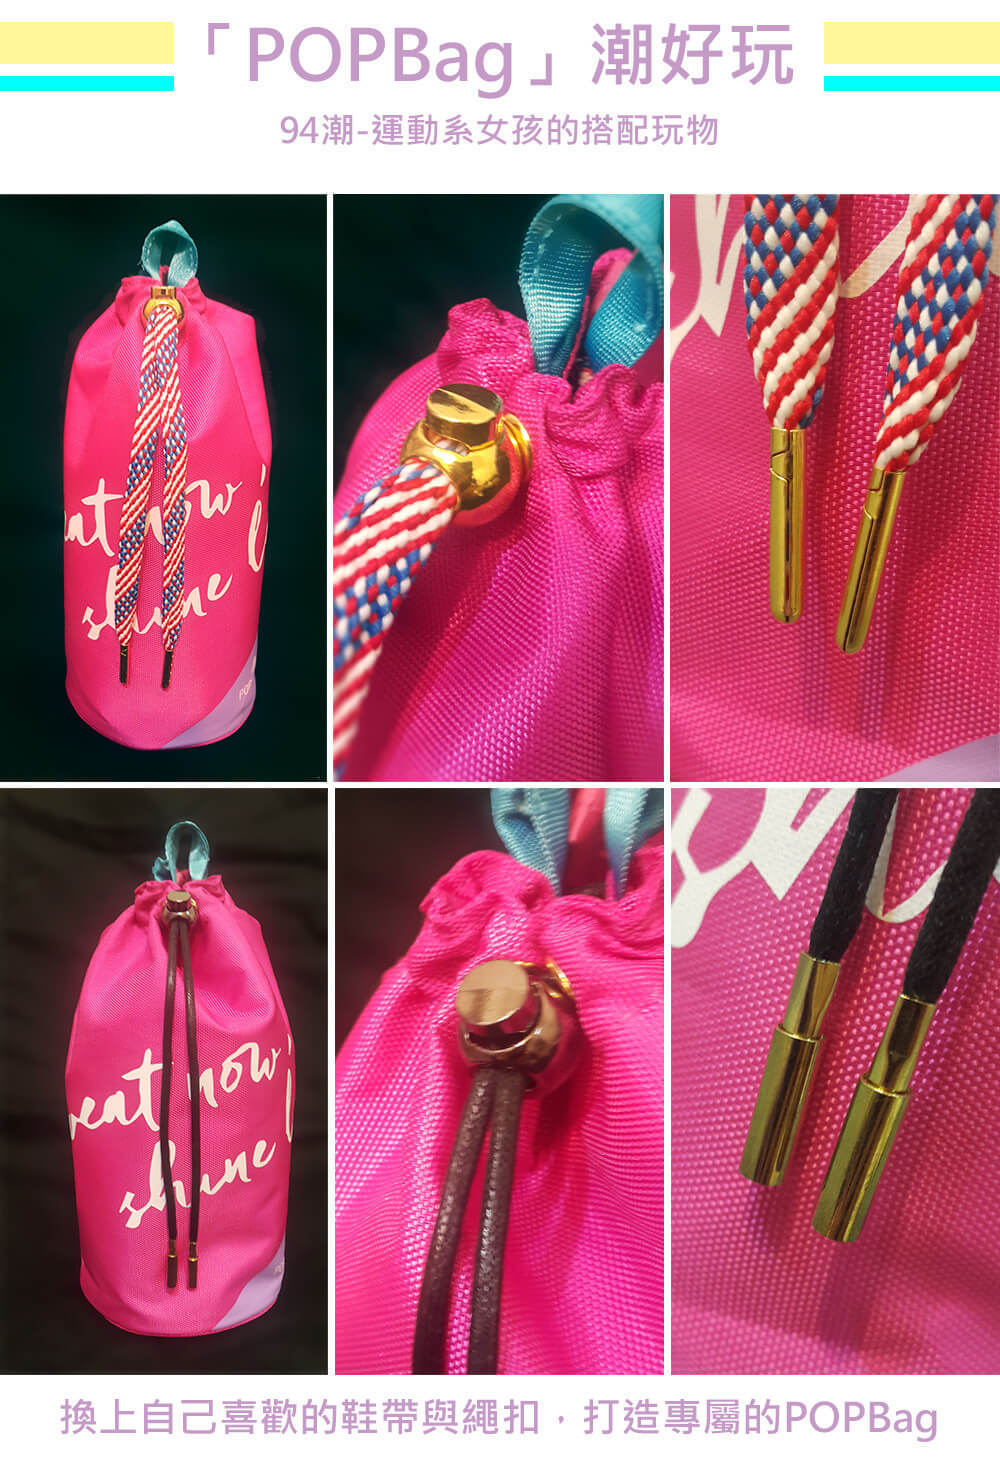 POPBag 品牌束口袋/收納包